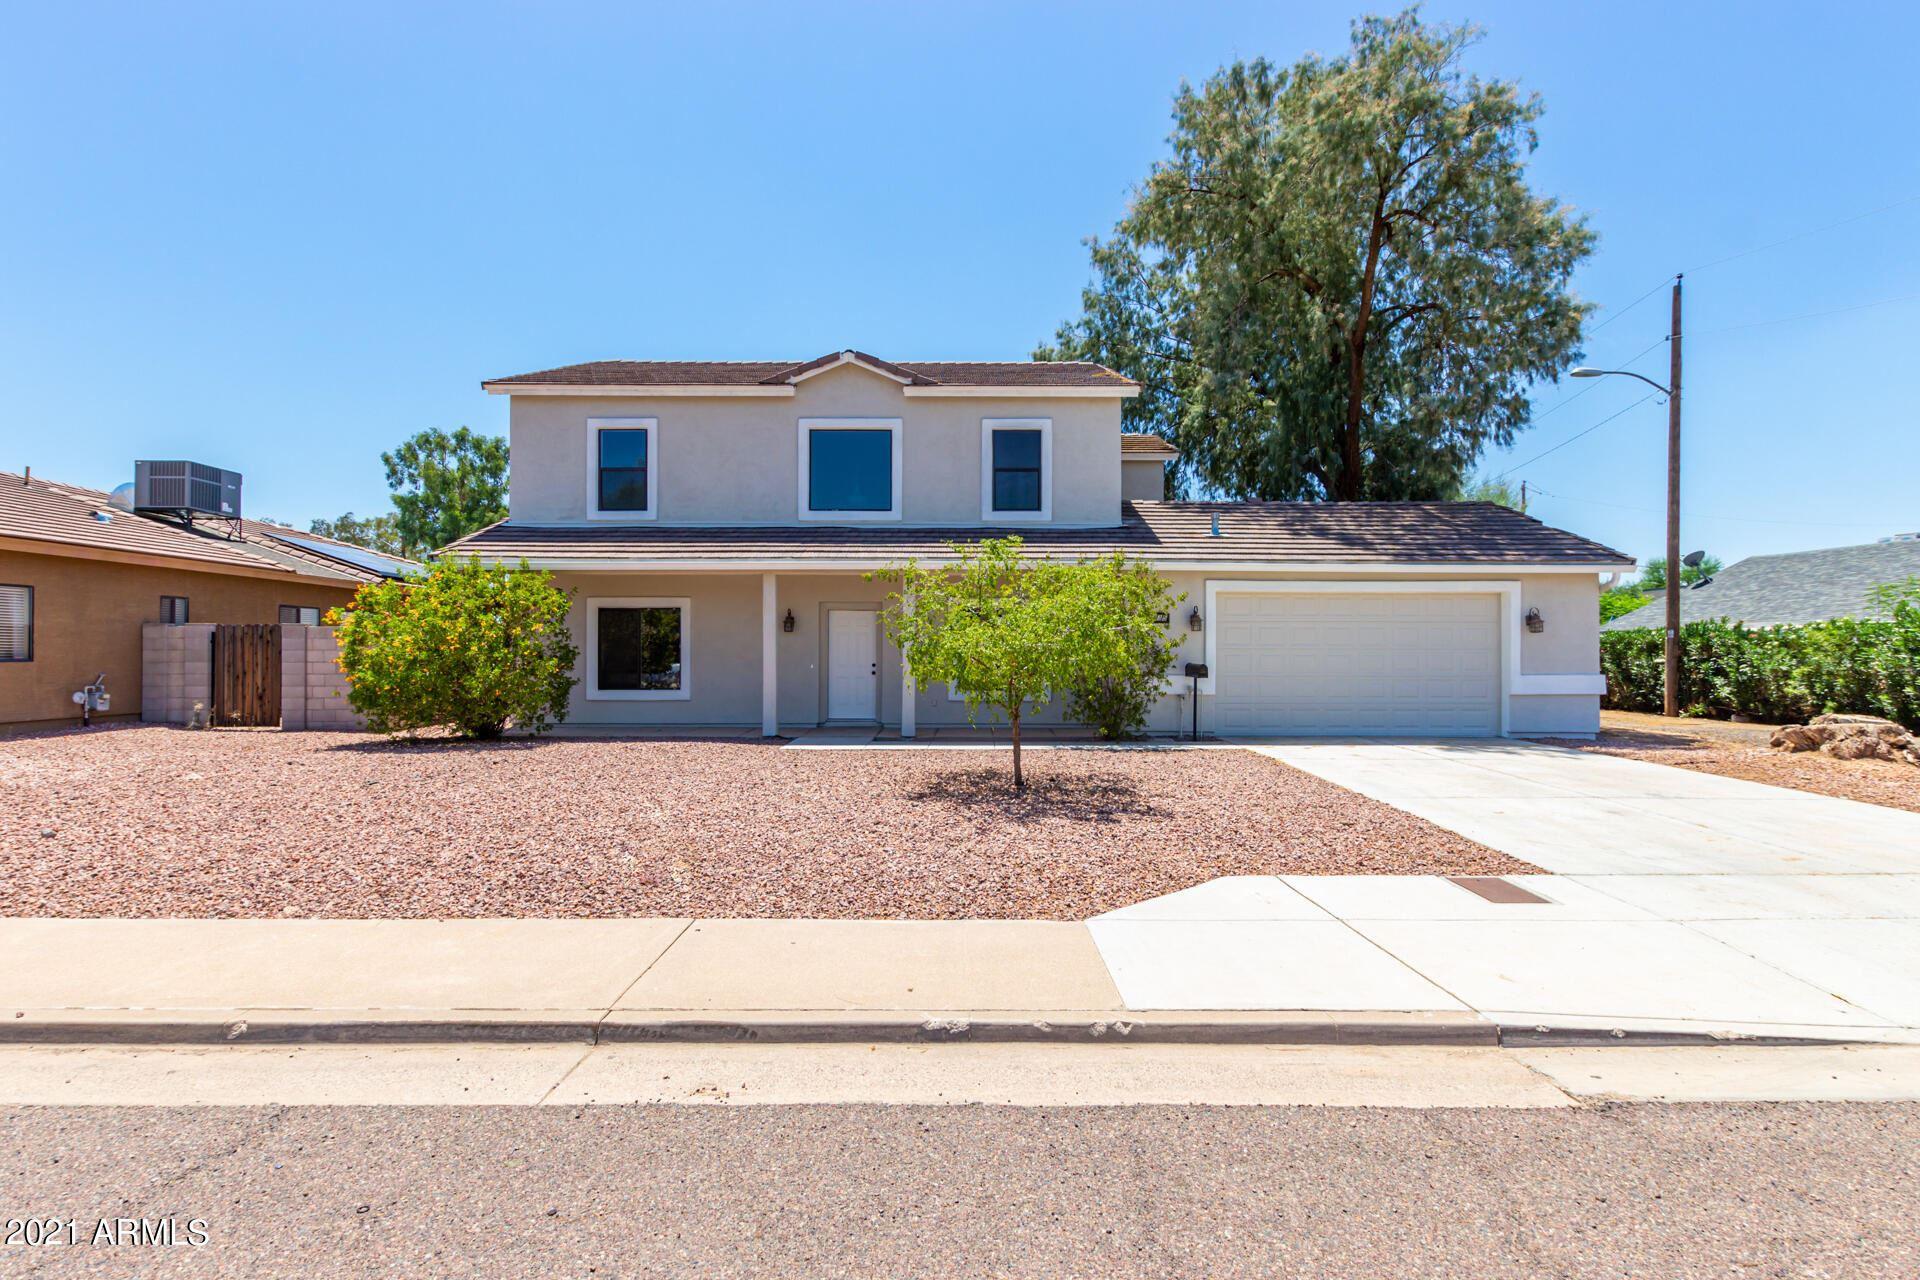 1435 E WELDON Avenue, Phoenix, AZ 85014 - MLS#: 6255590